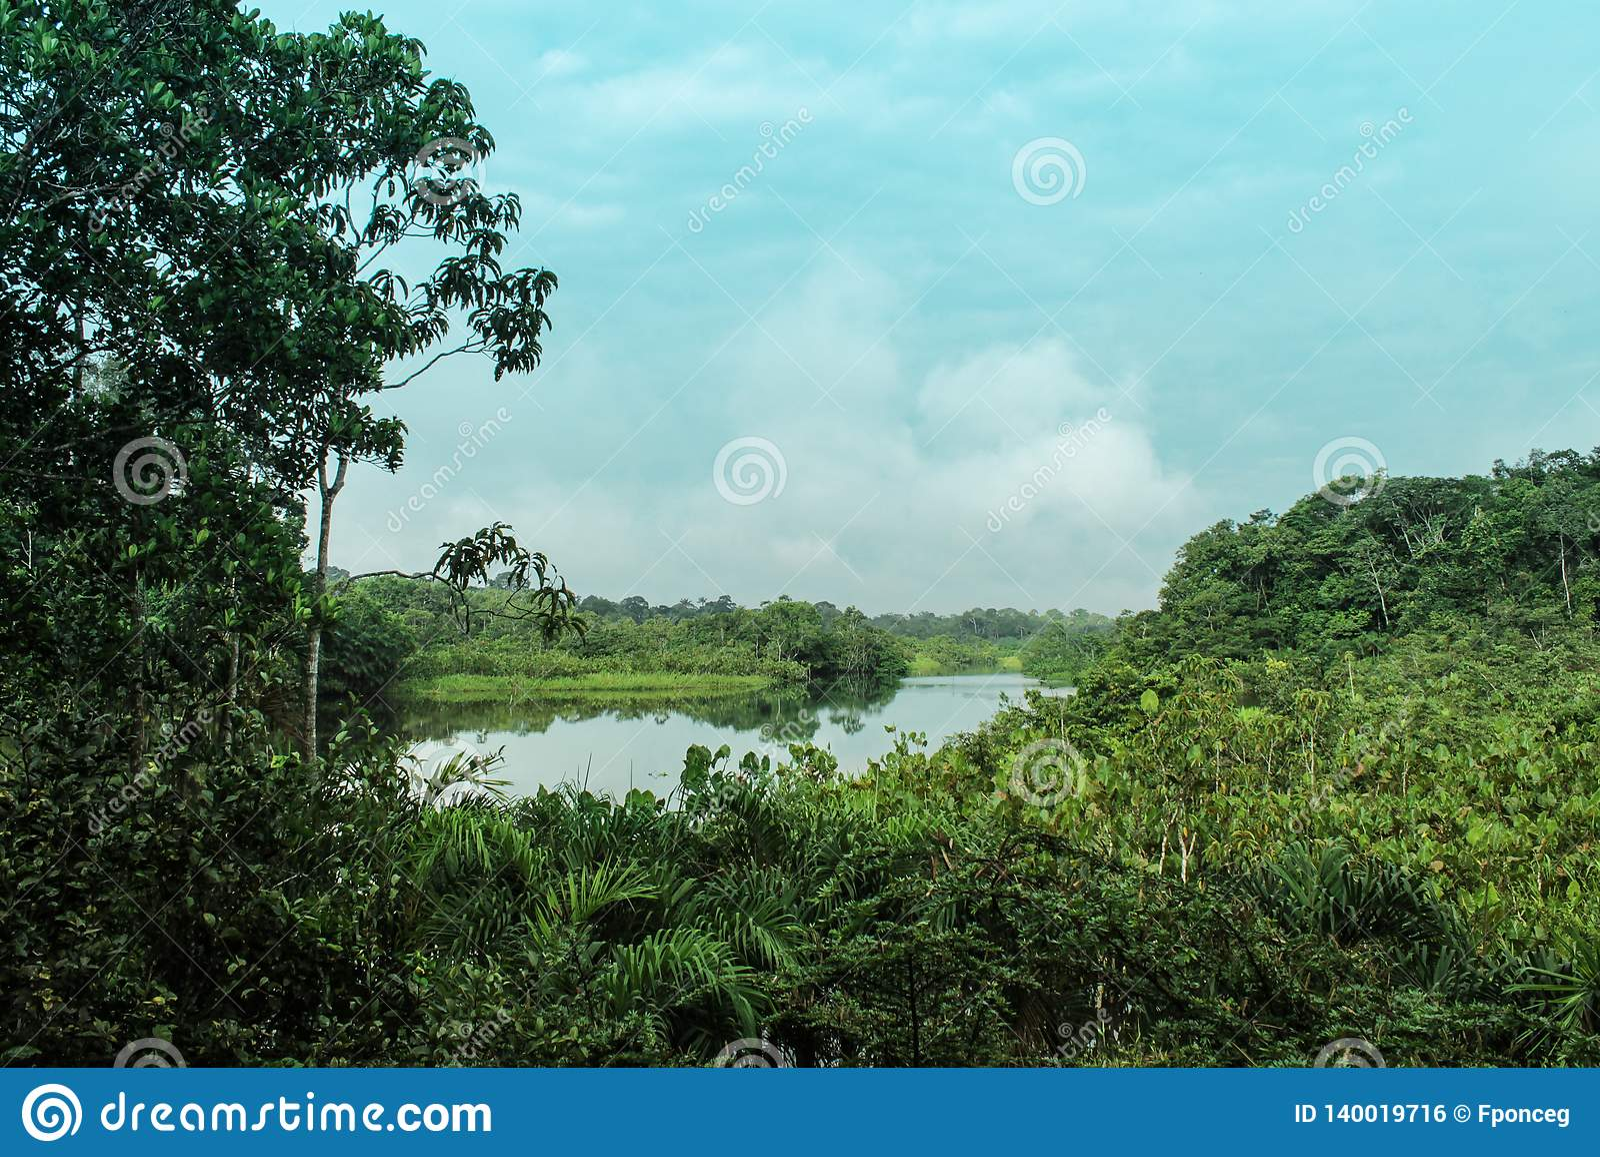 River scene in the amazonía of ecuador